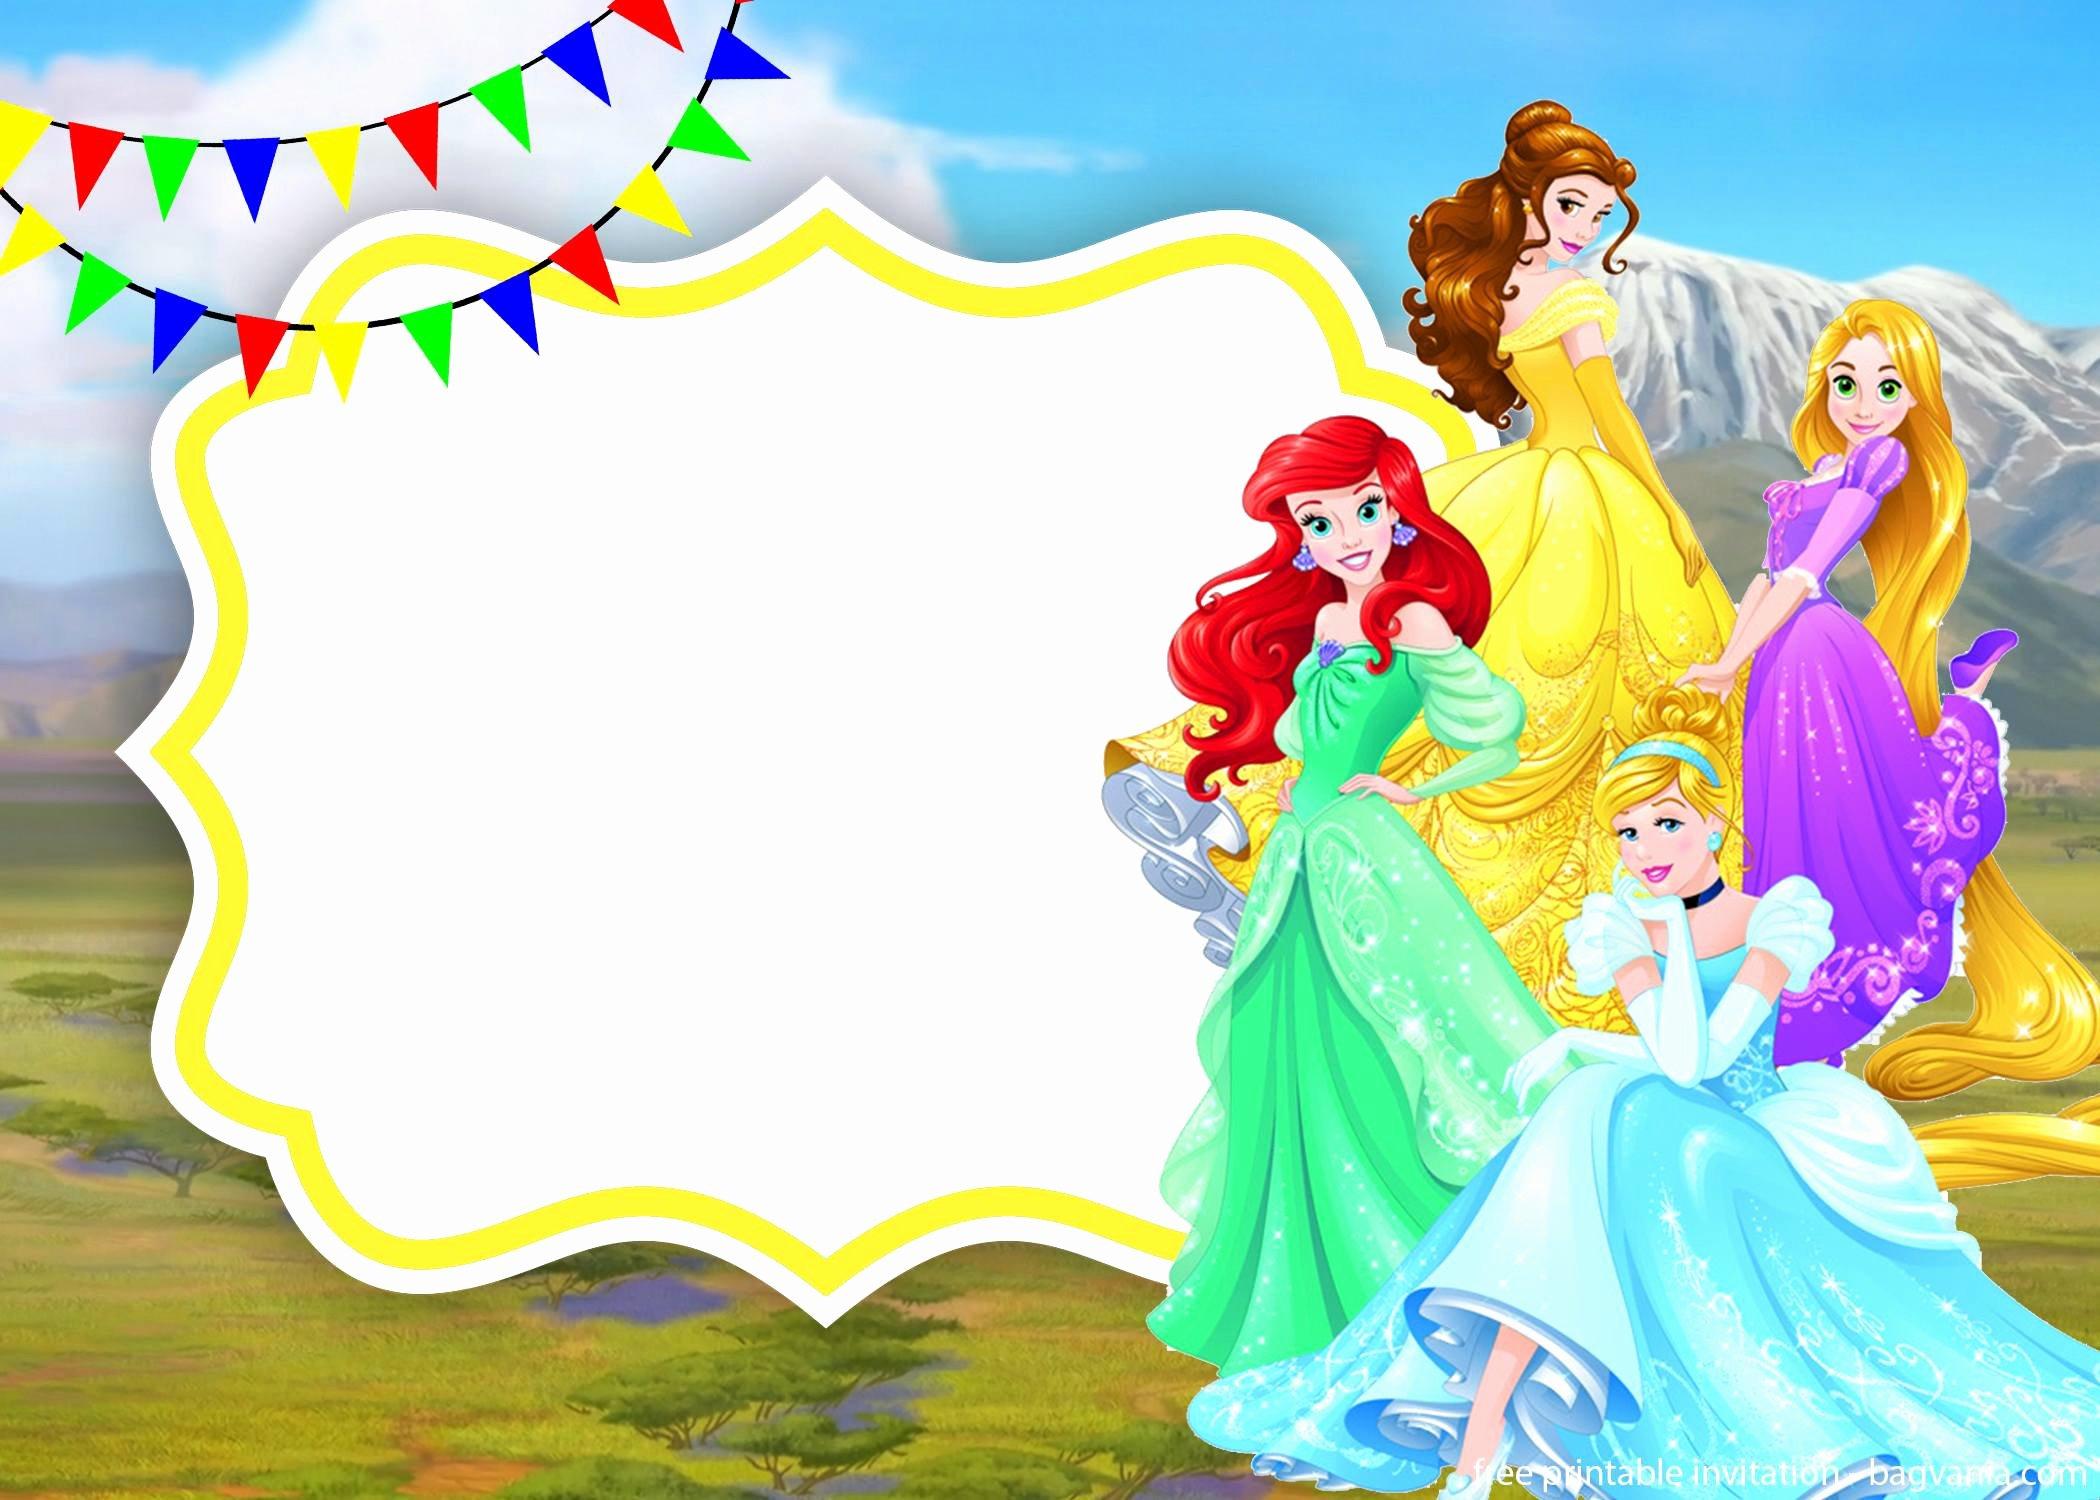 Disney Princess Invitation Templates Free Luxury Golden Disney Princesses Invitation Template – Free